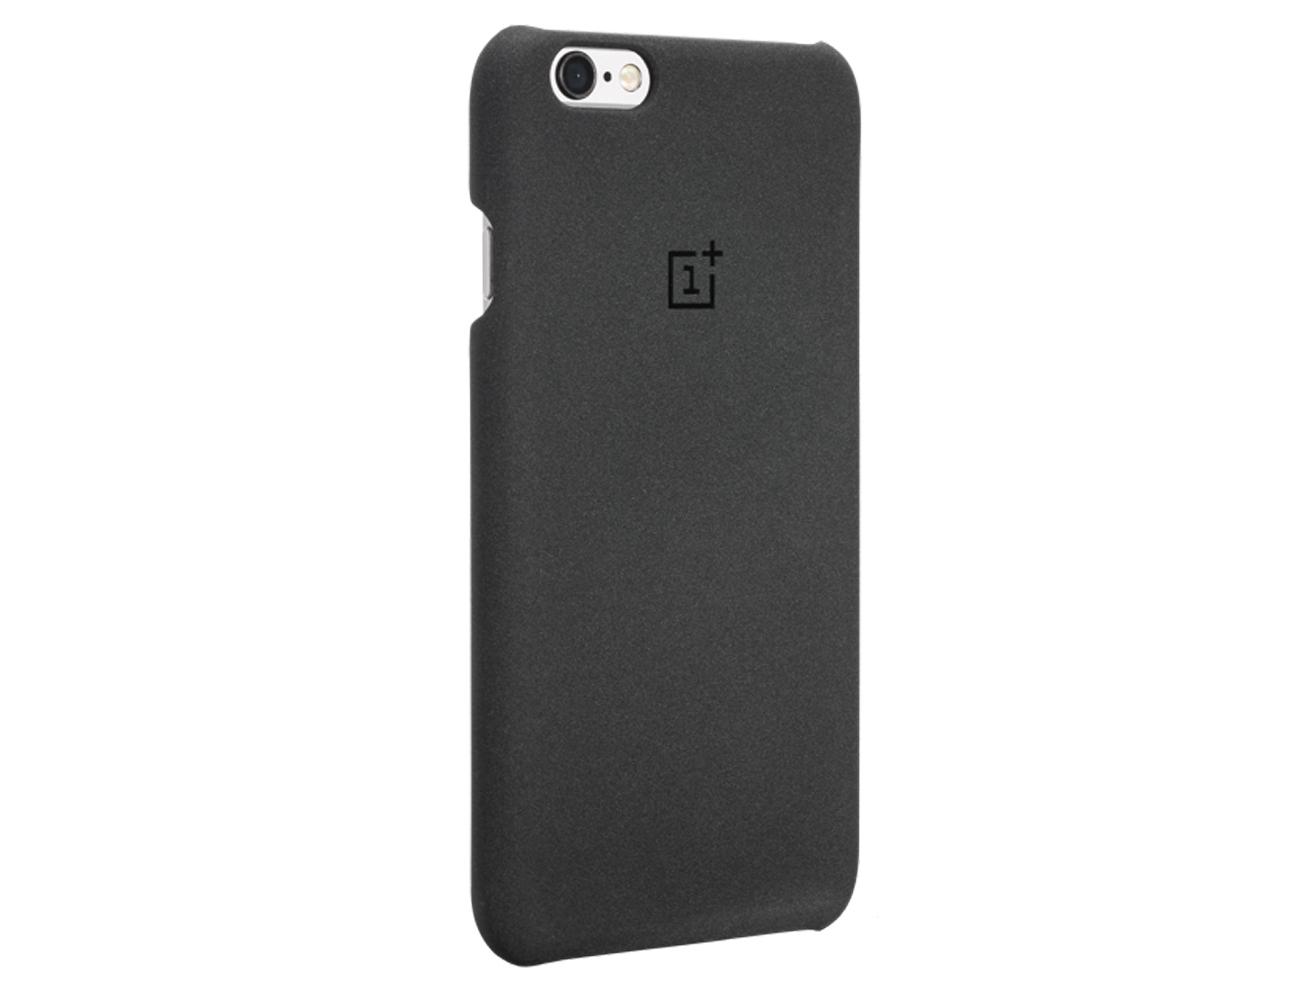 OnePlus Sandstone Case for iPhone